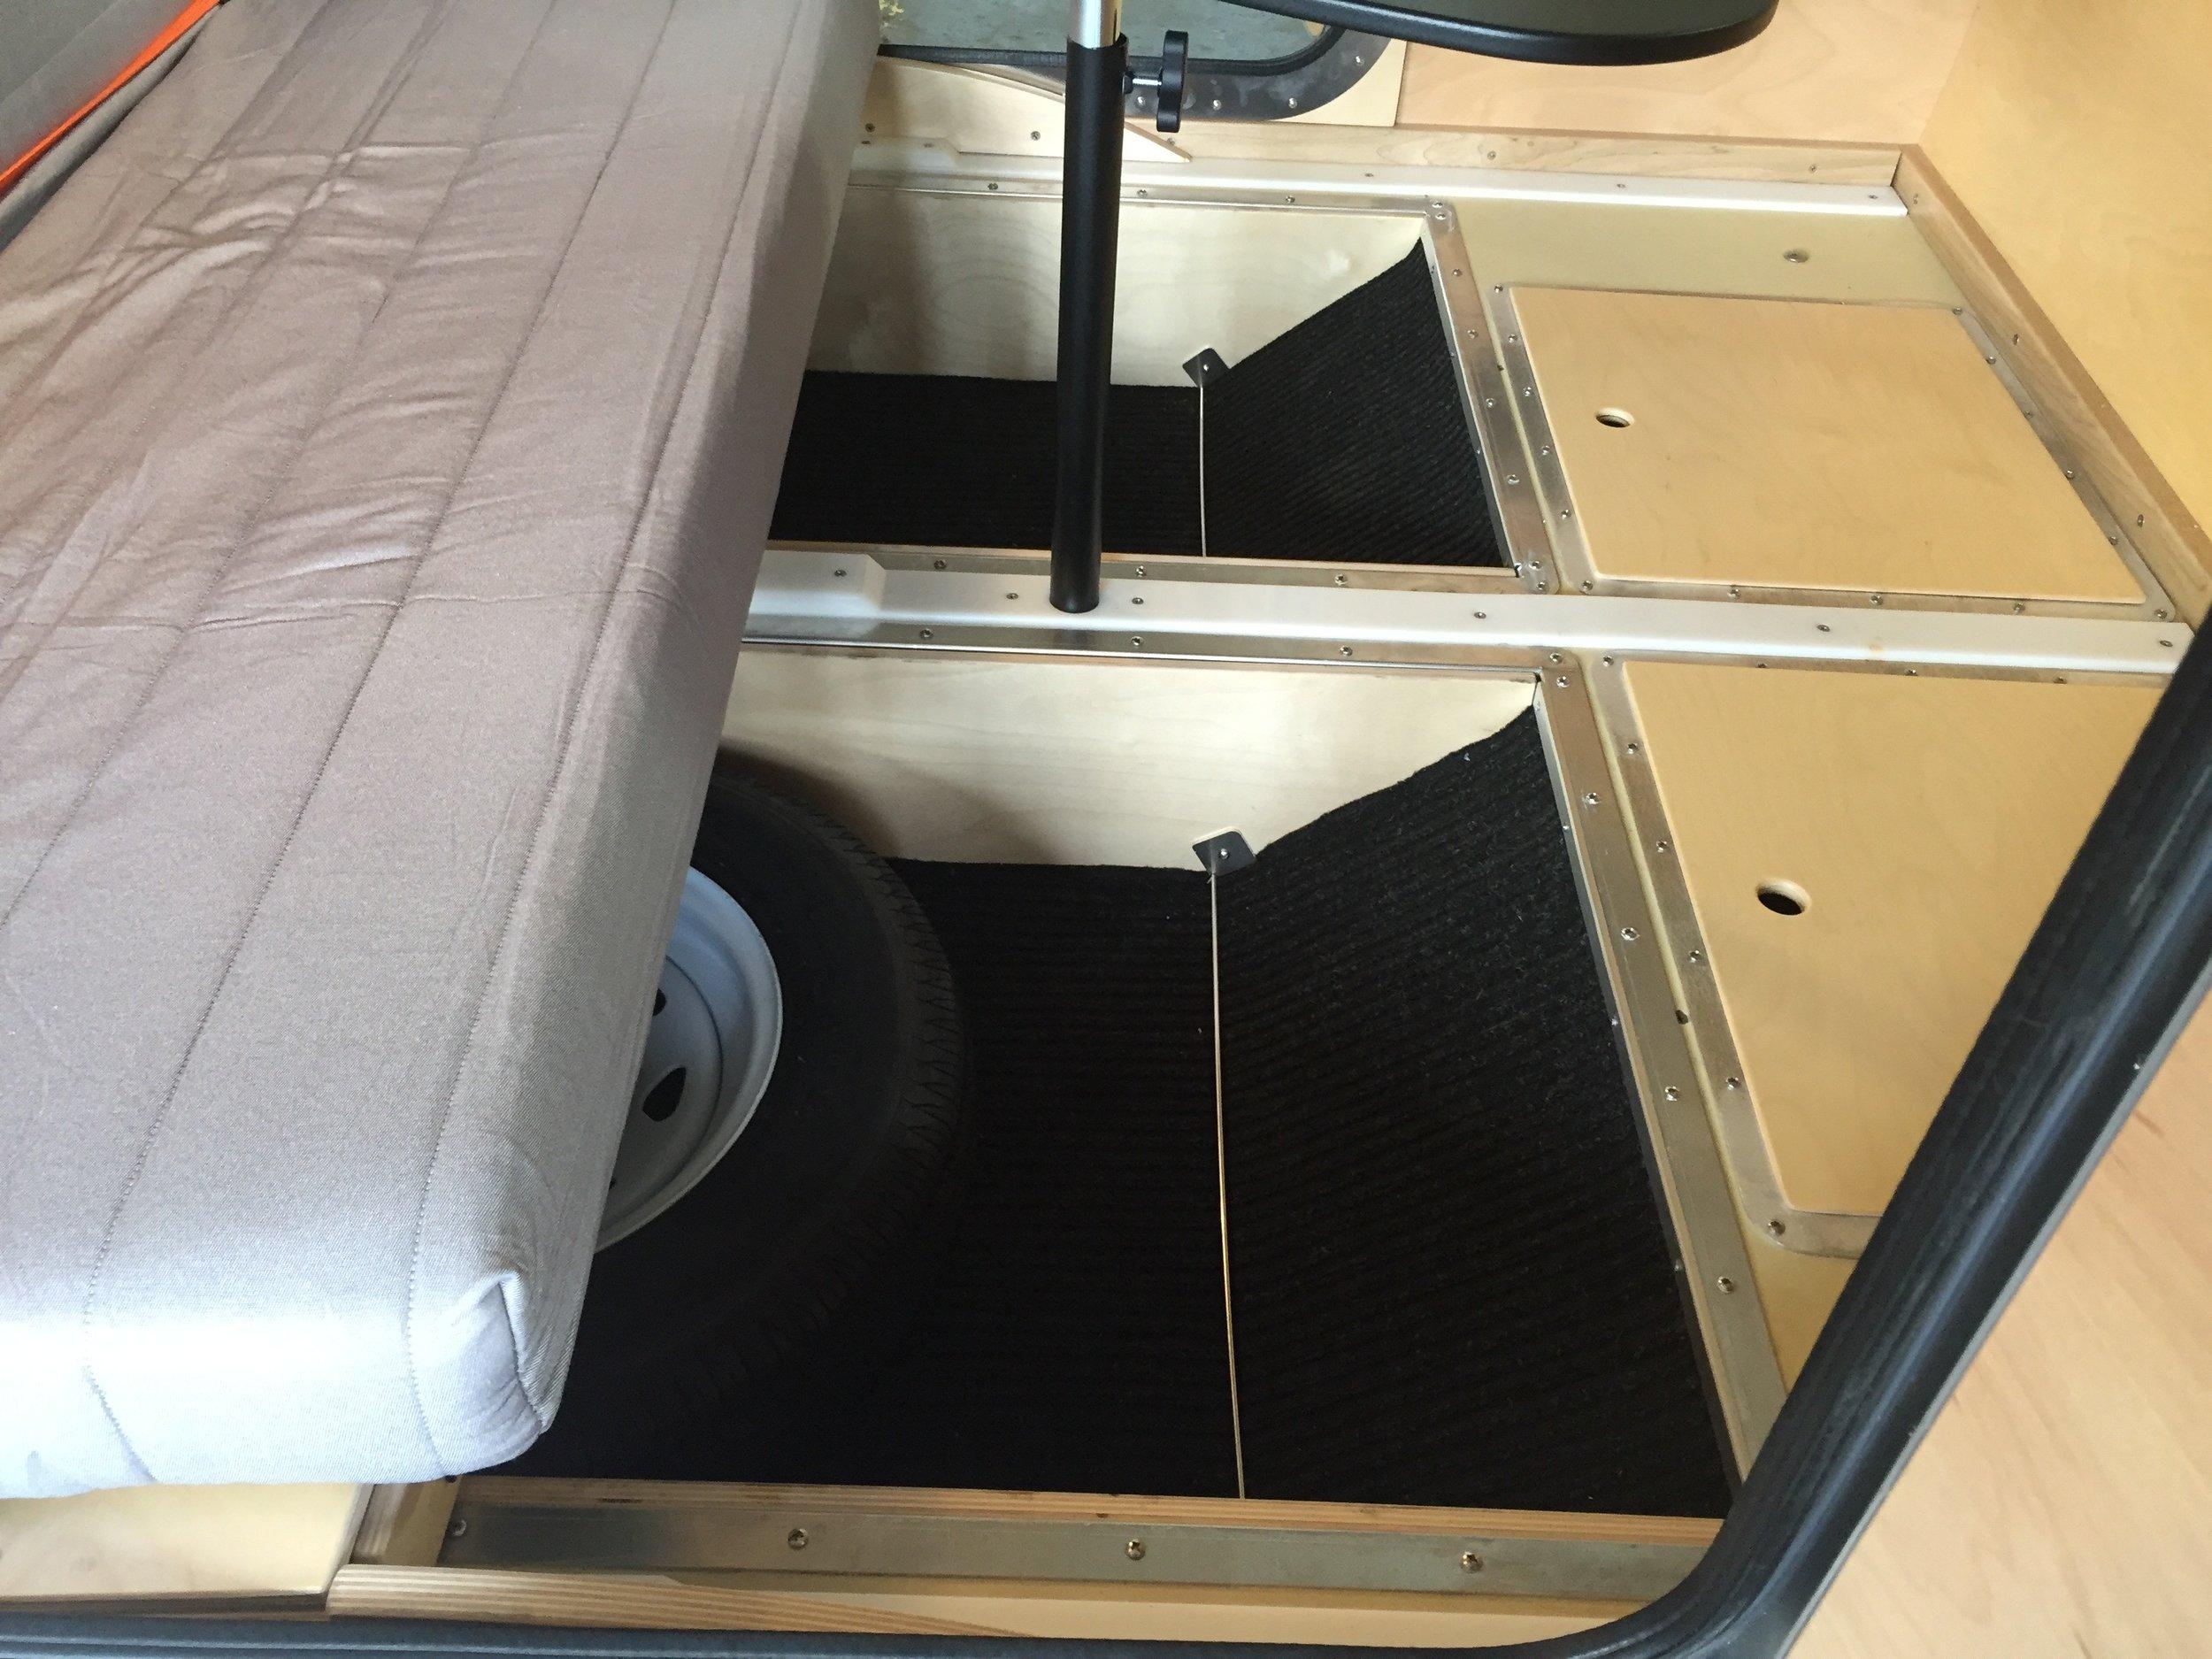 Teardrop camper _ under bed storage compartments.jpg